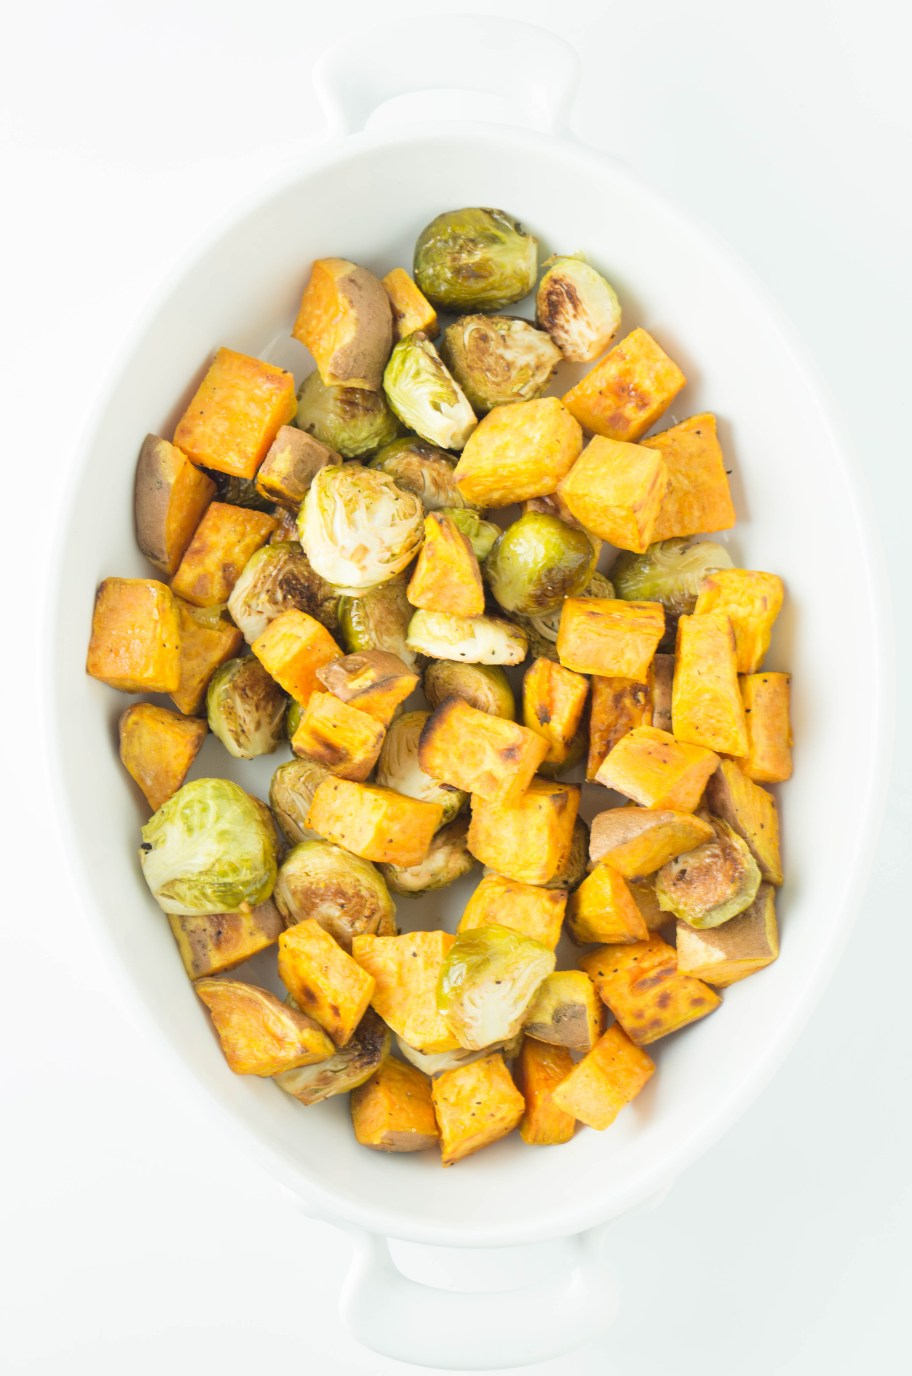 EASY Roasted Sweet Potatoes! #oliveoil #healthydinnerideas #veganrecipes #vegandinner | www.wakeuptowaffles.com